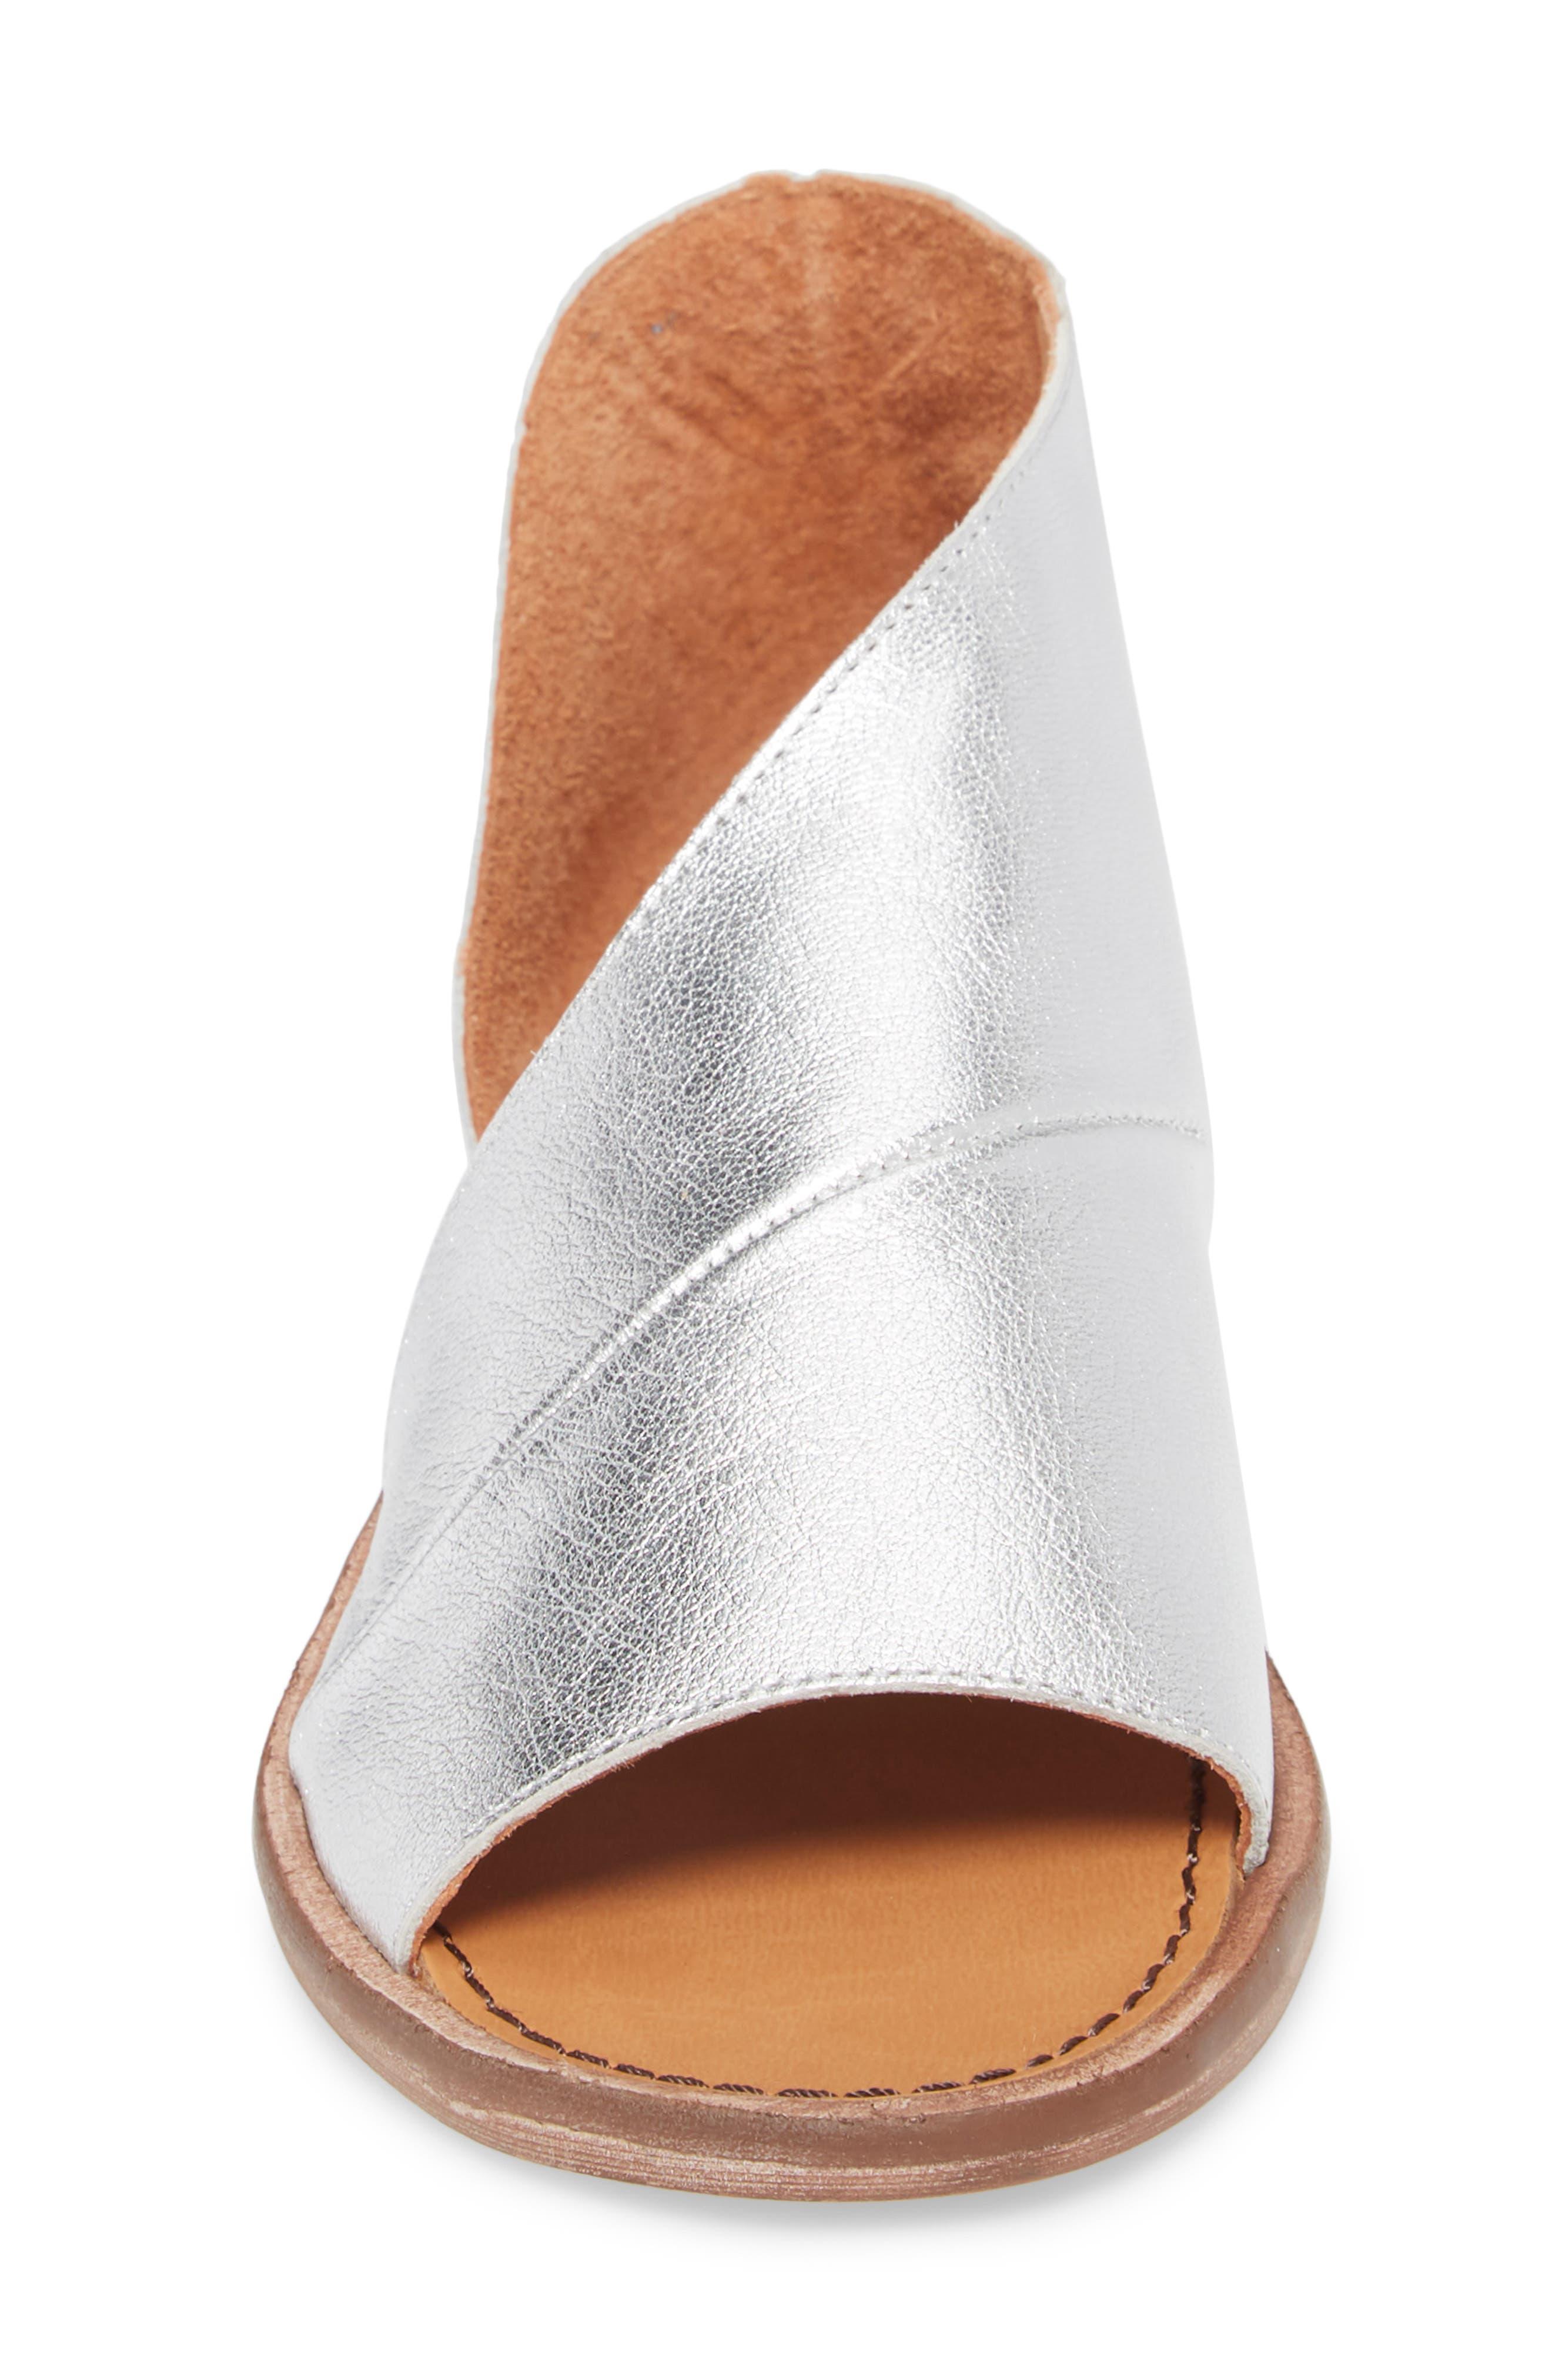 'Mont Blanc' Asymmetrical Sandal,                             Alternate thumbnail 44, color,